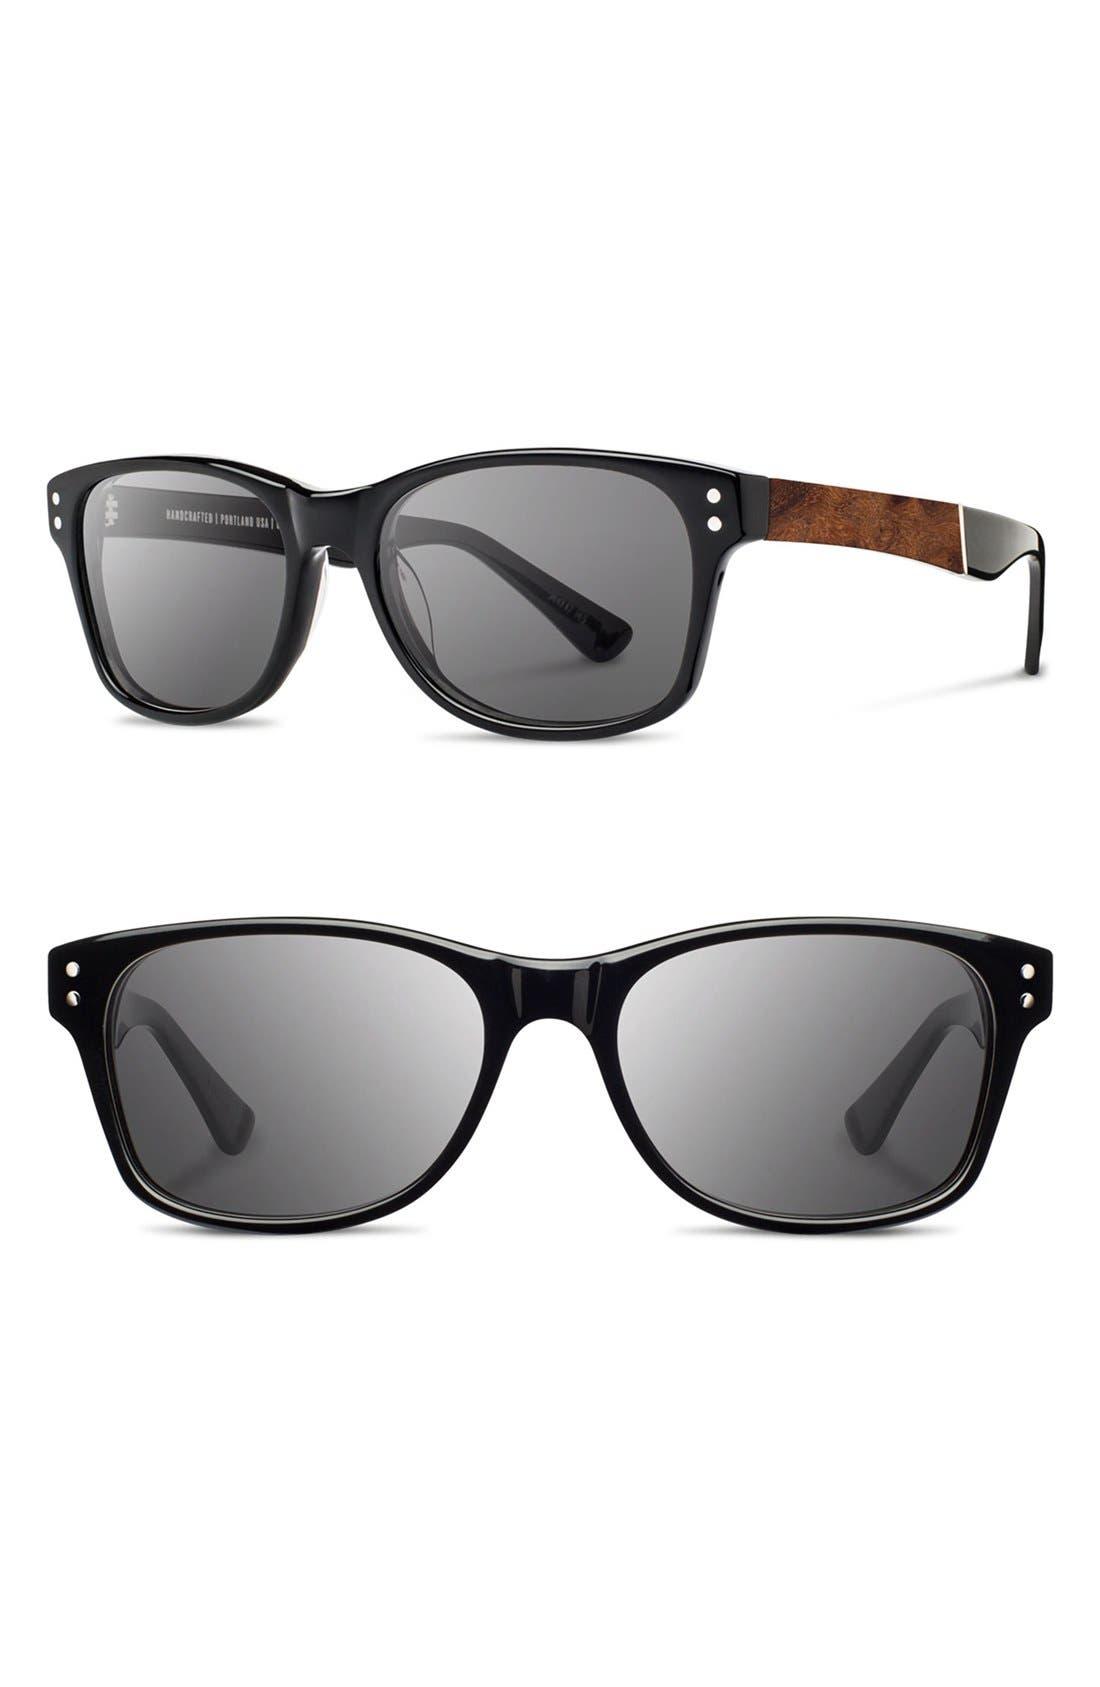 'Cannon' 54mm Polarized Acetate & Wood Sunglasses,                         Main,                         color, Black/ Elm Bur/ Grey